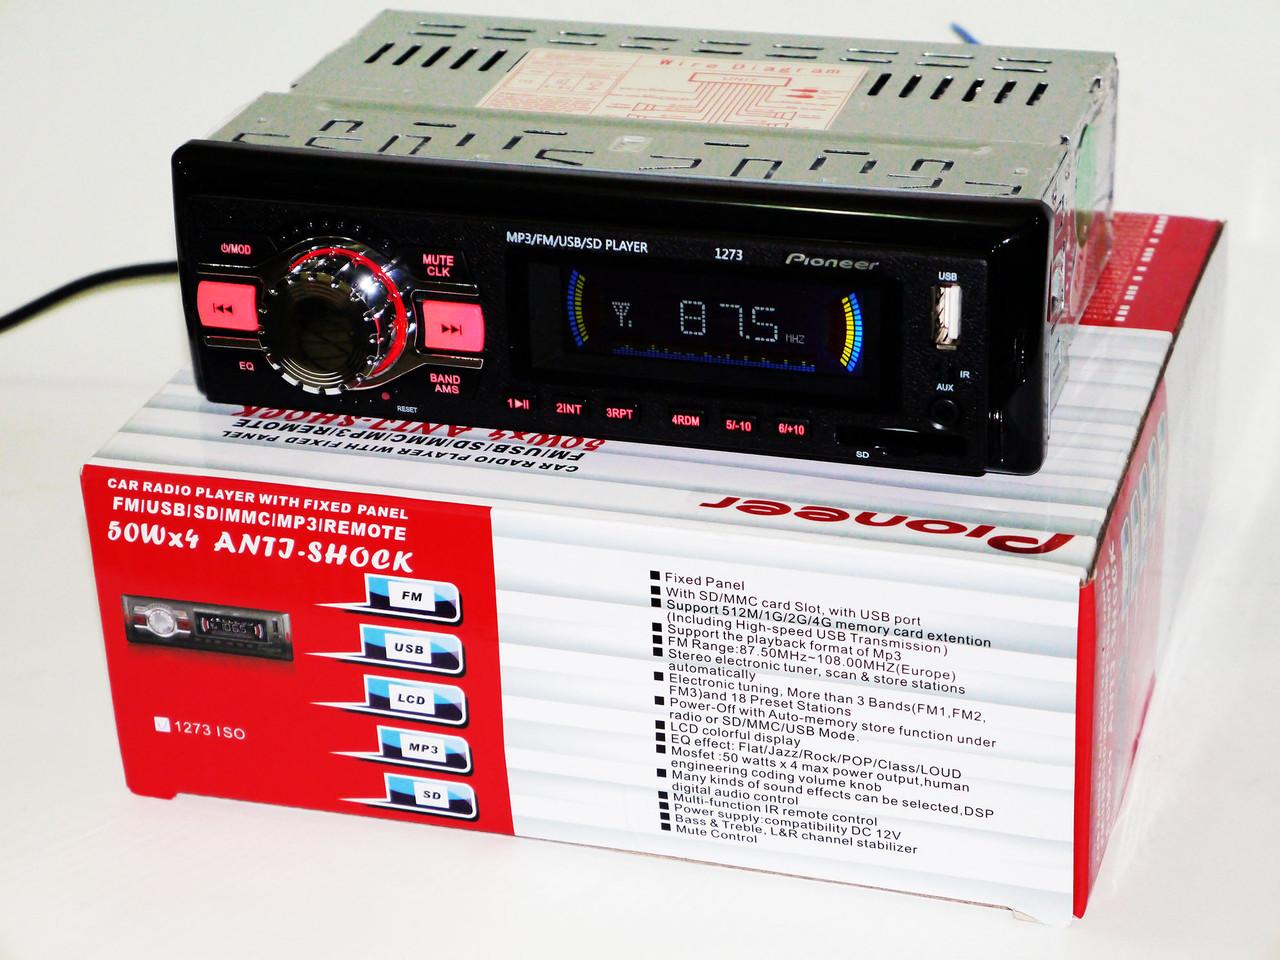 Автомагнитола Pioneer 1273 ISO USB+SD+FM+AUX+ пульт (4x50W)